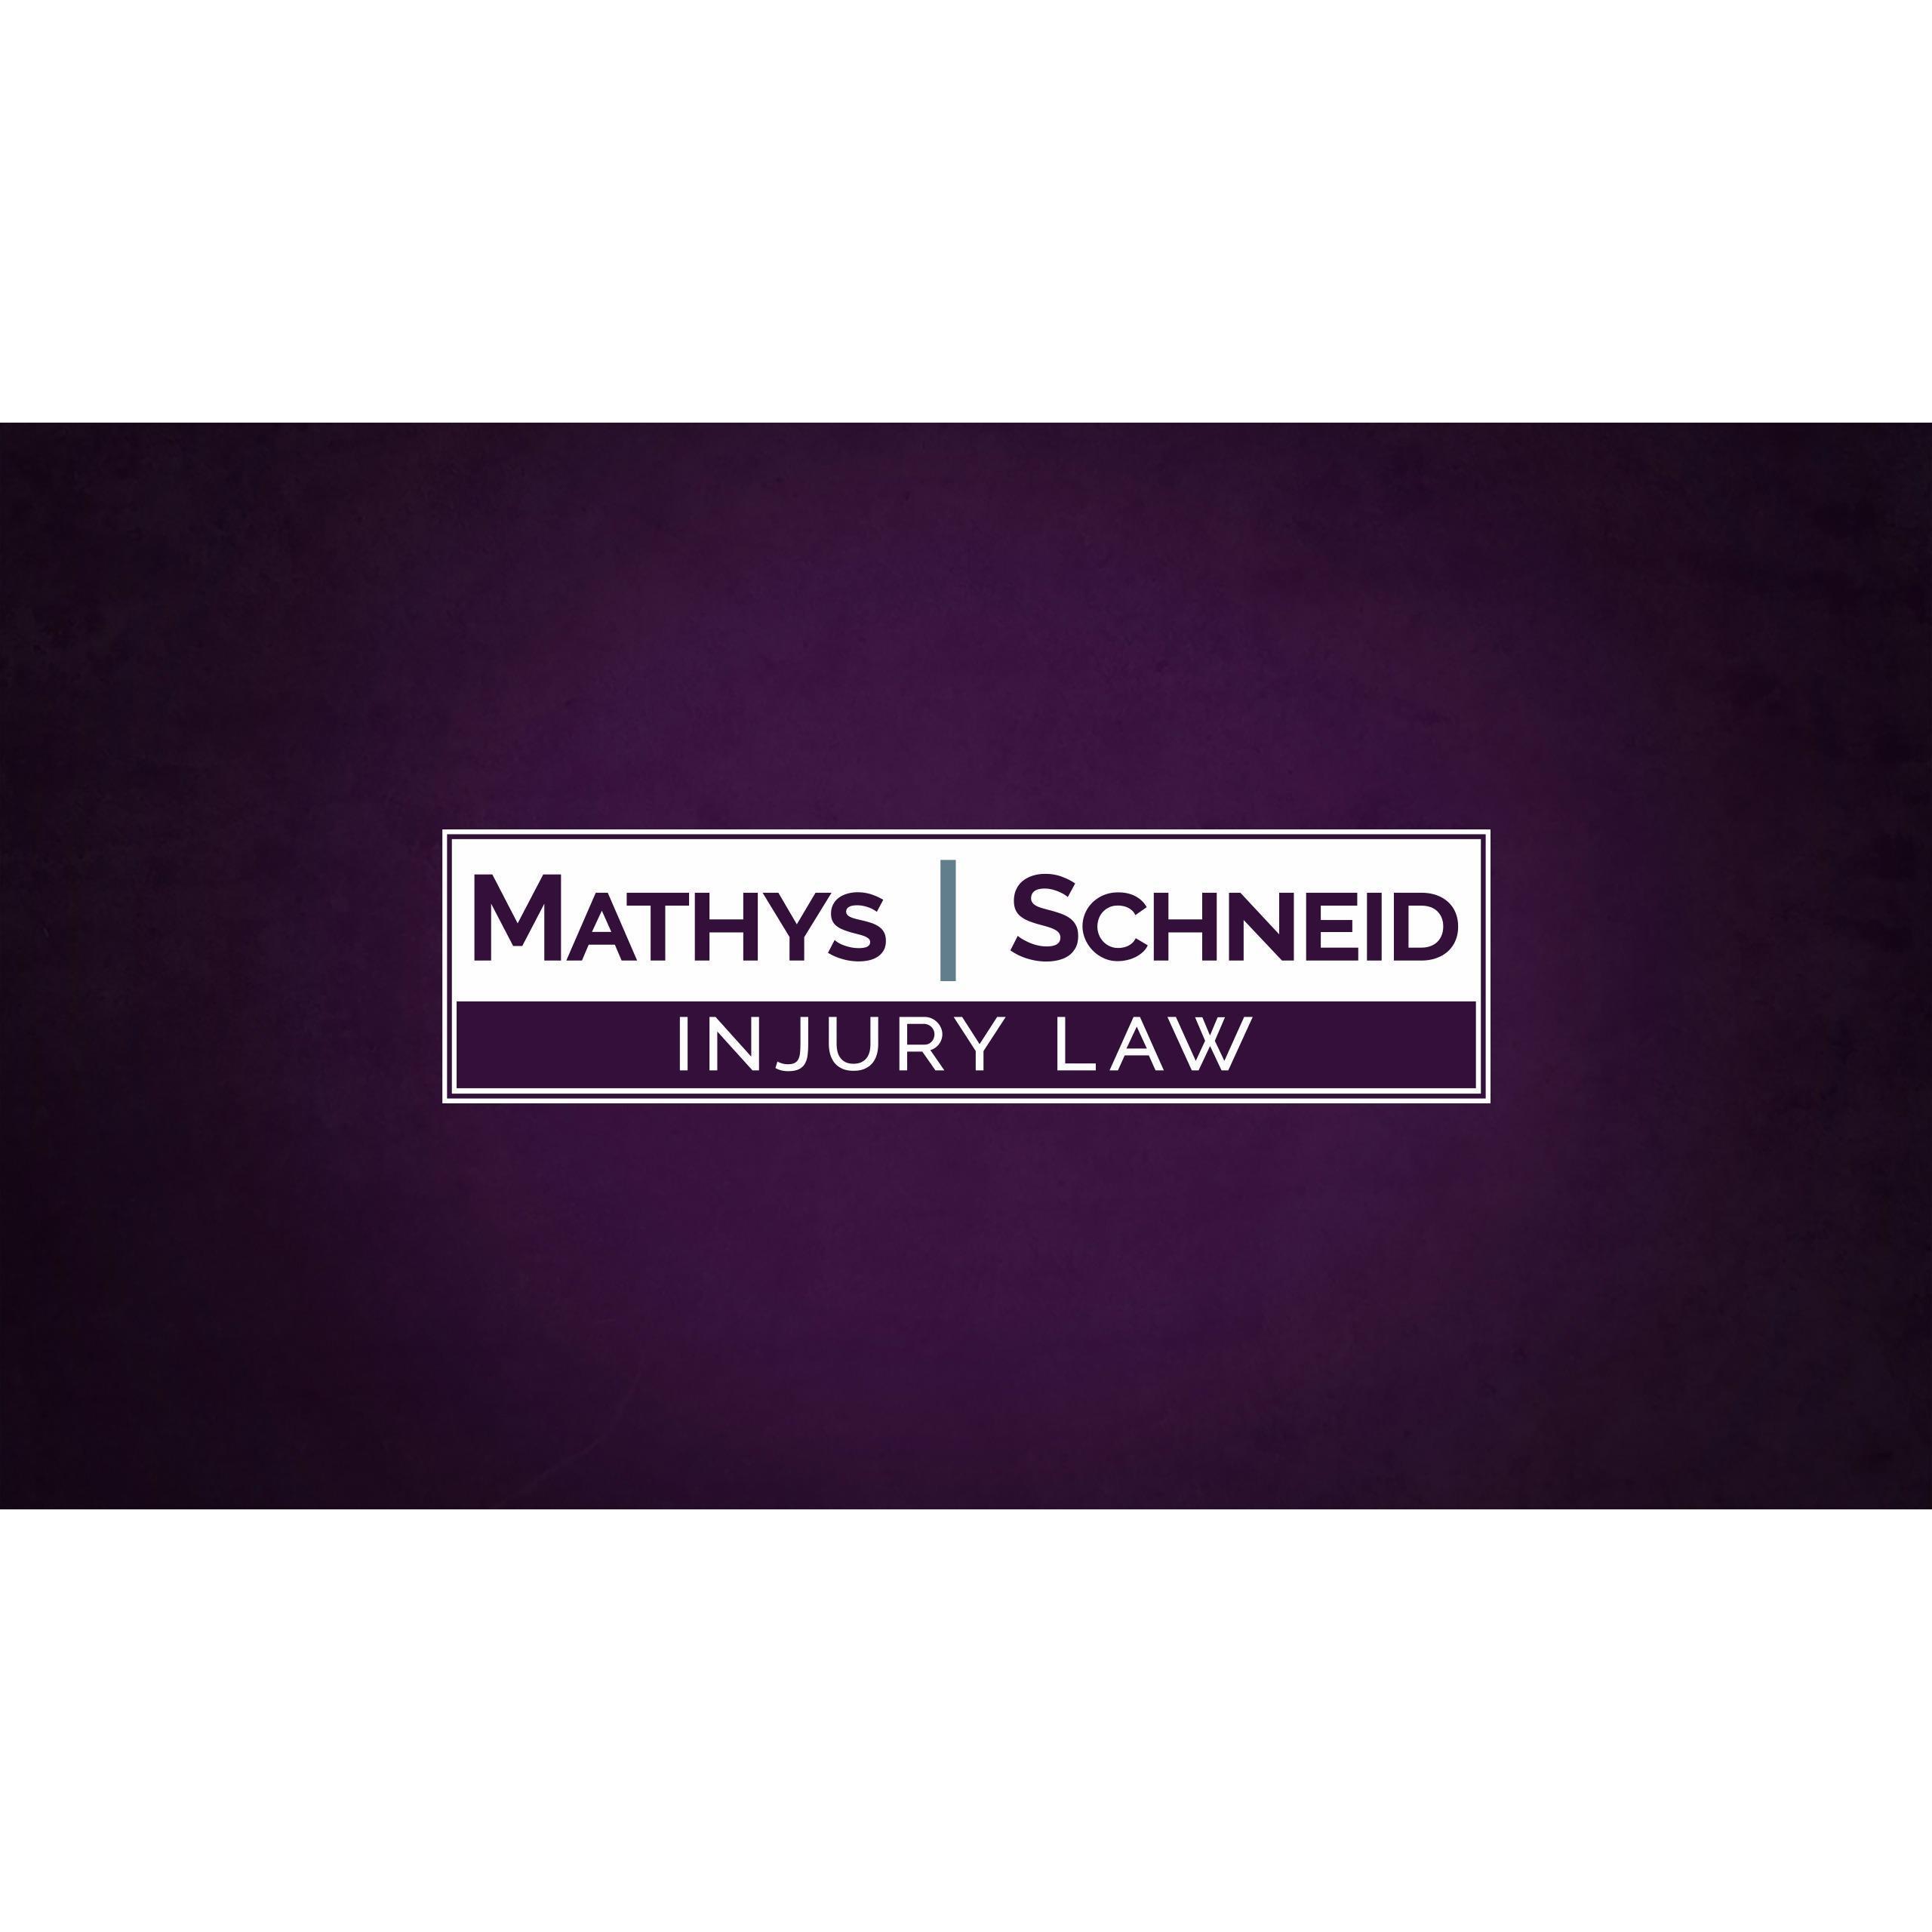 Mathys & Schneid Injury Law